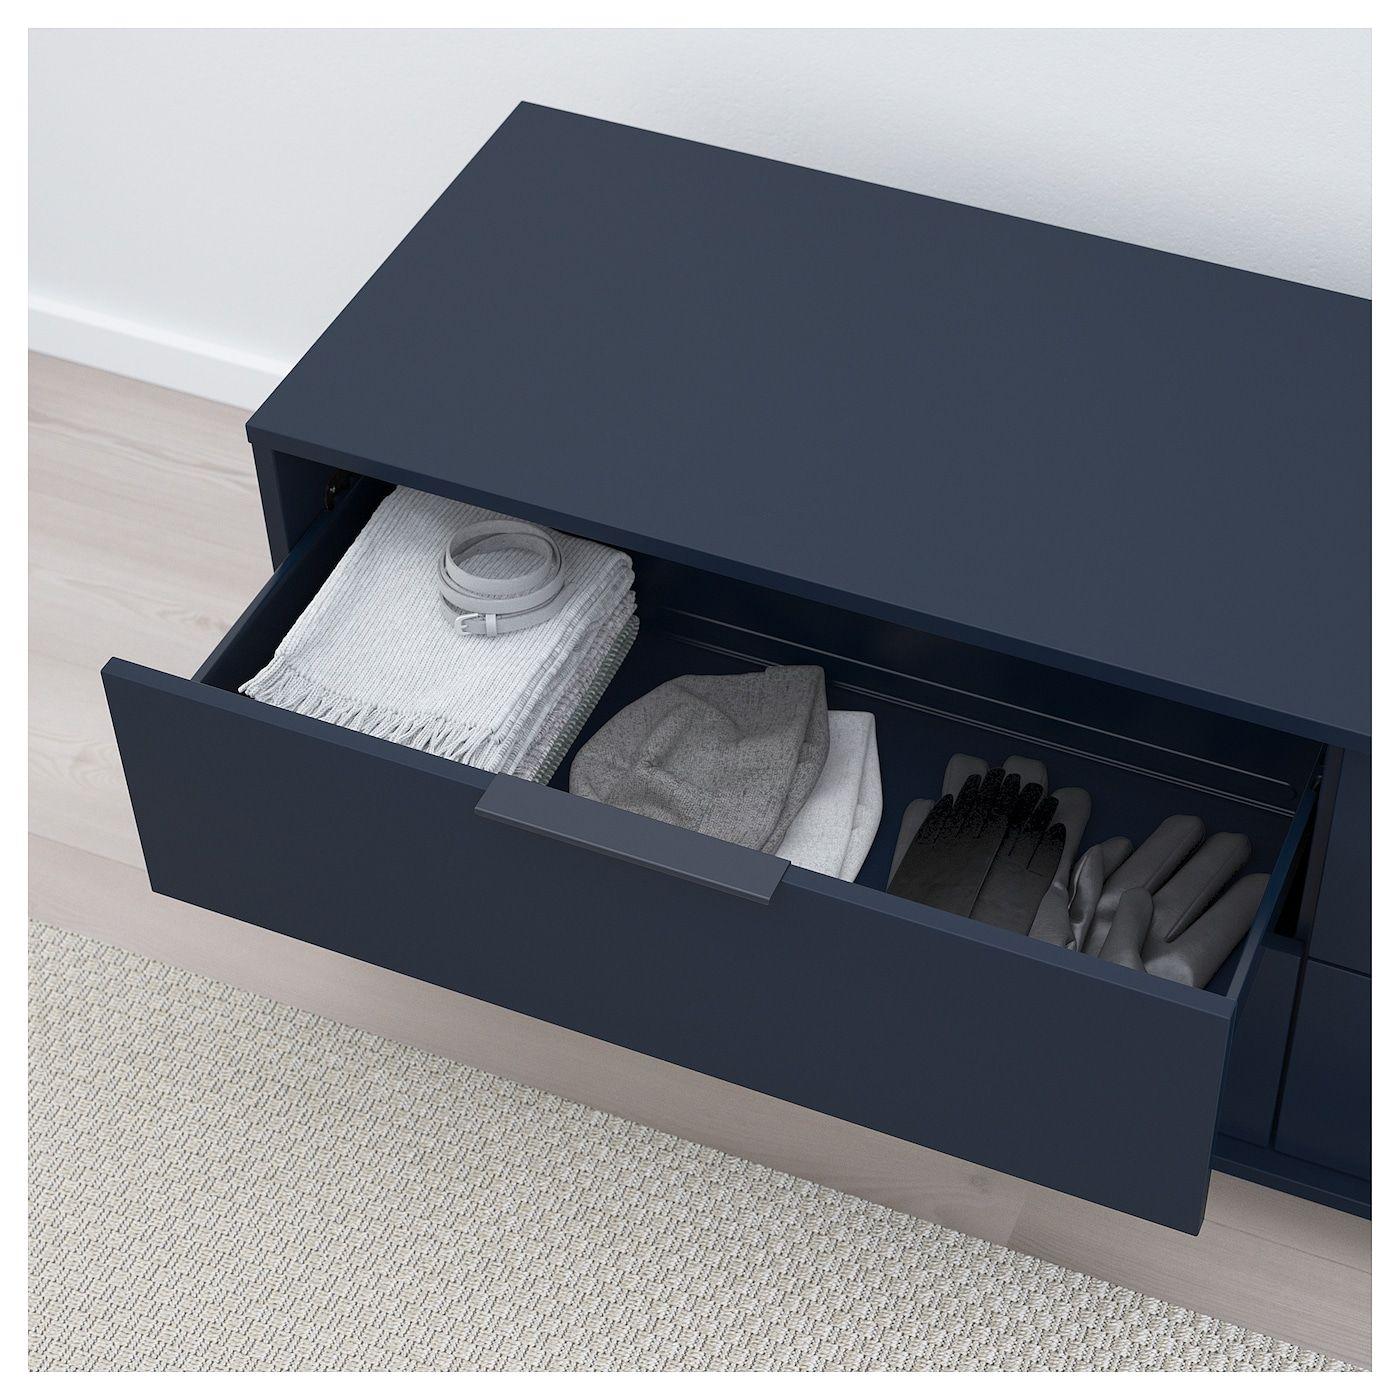 Nordmela Ladekast Met 4 Lades Zwartblauw 159x50 Cm Ikea 4 Drawer Dresser Dresser Drawers Ikea 8 Drawer Dresser [ 1400 x 1400 Pixel ]